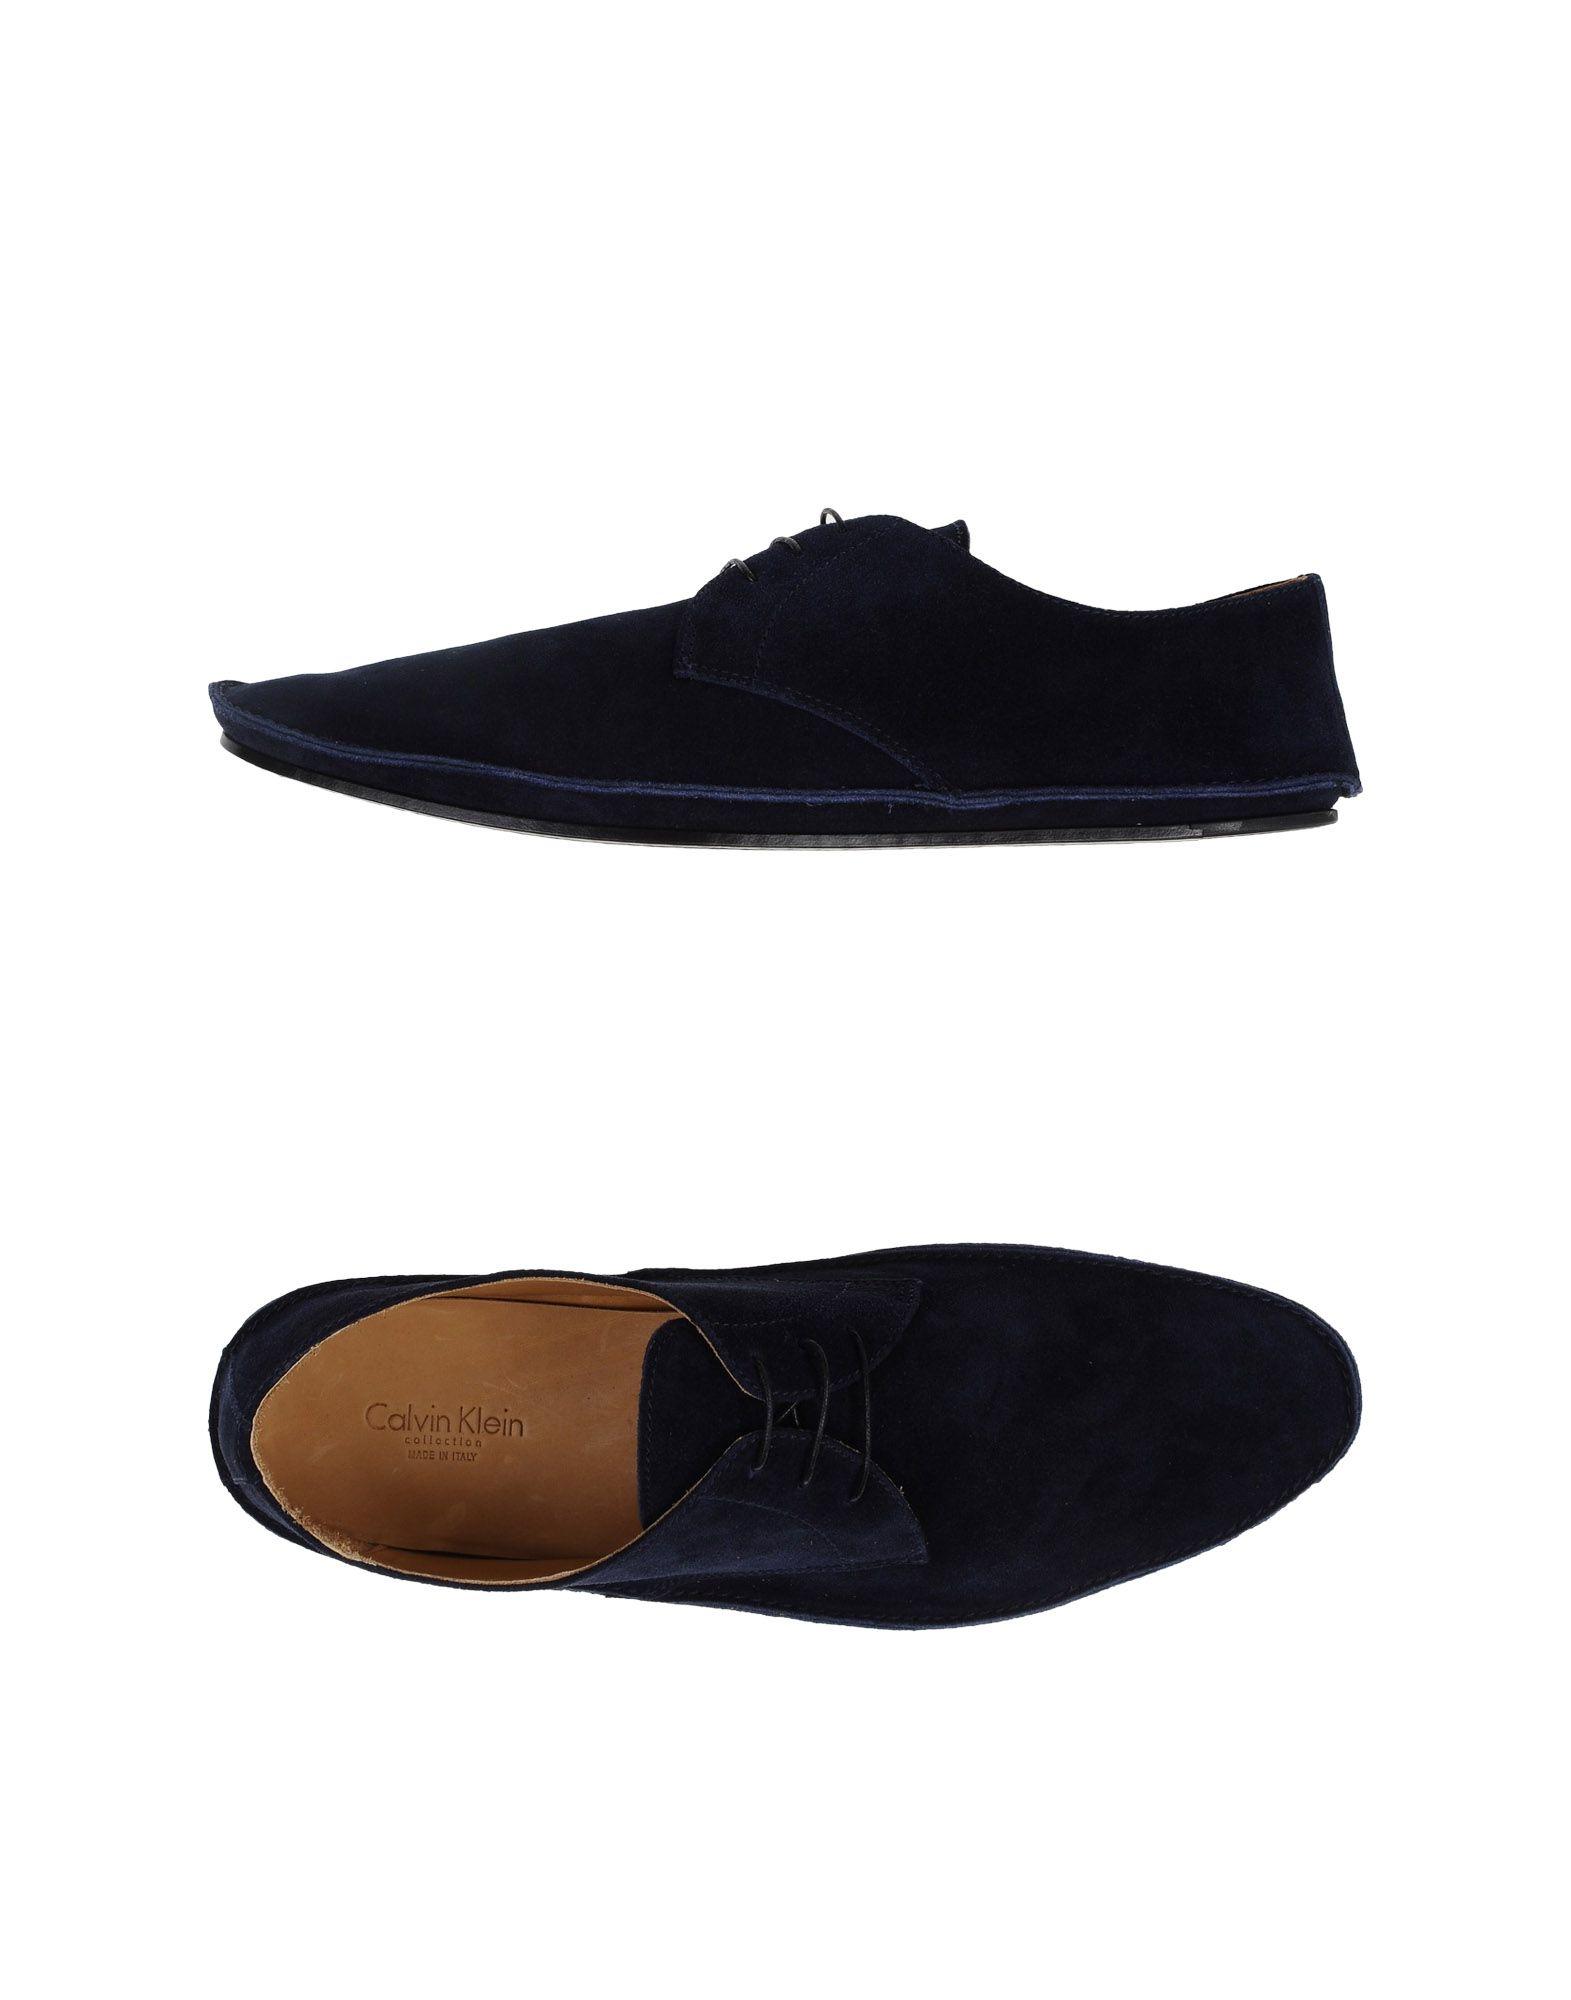 calvin klein lace up shoes in blue for men lyst. Black Bedroom Furniture Sets. Home Design Ideas